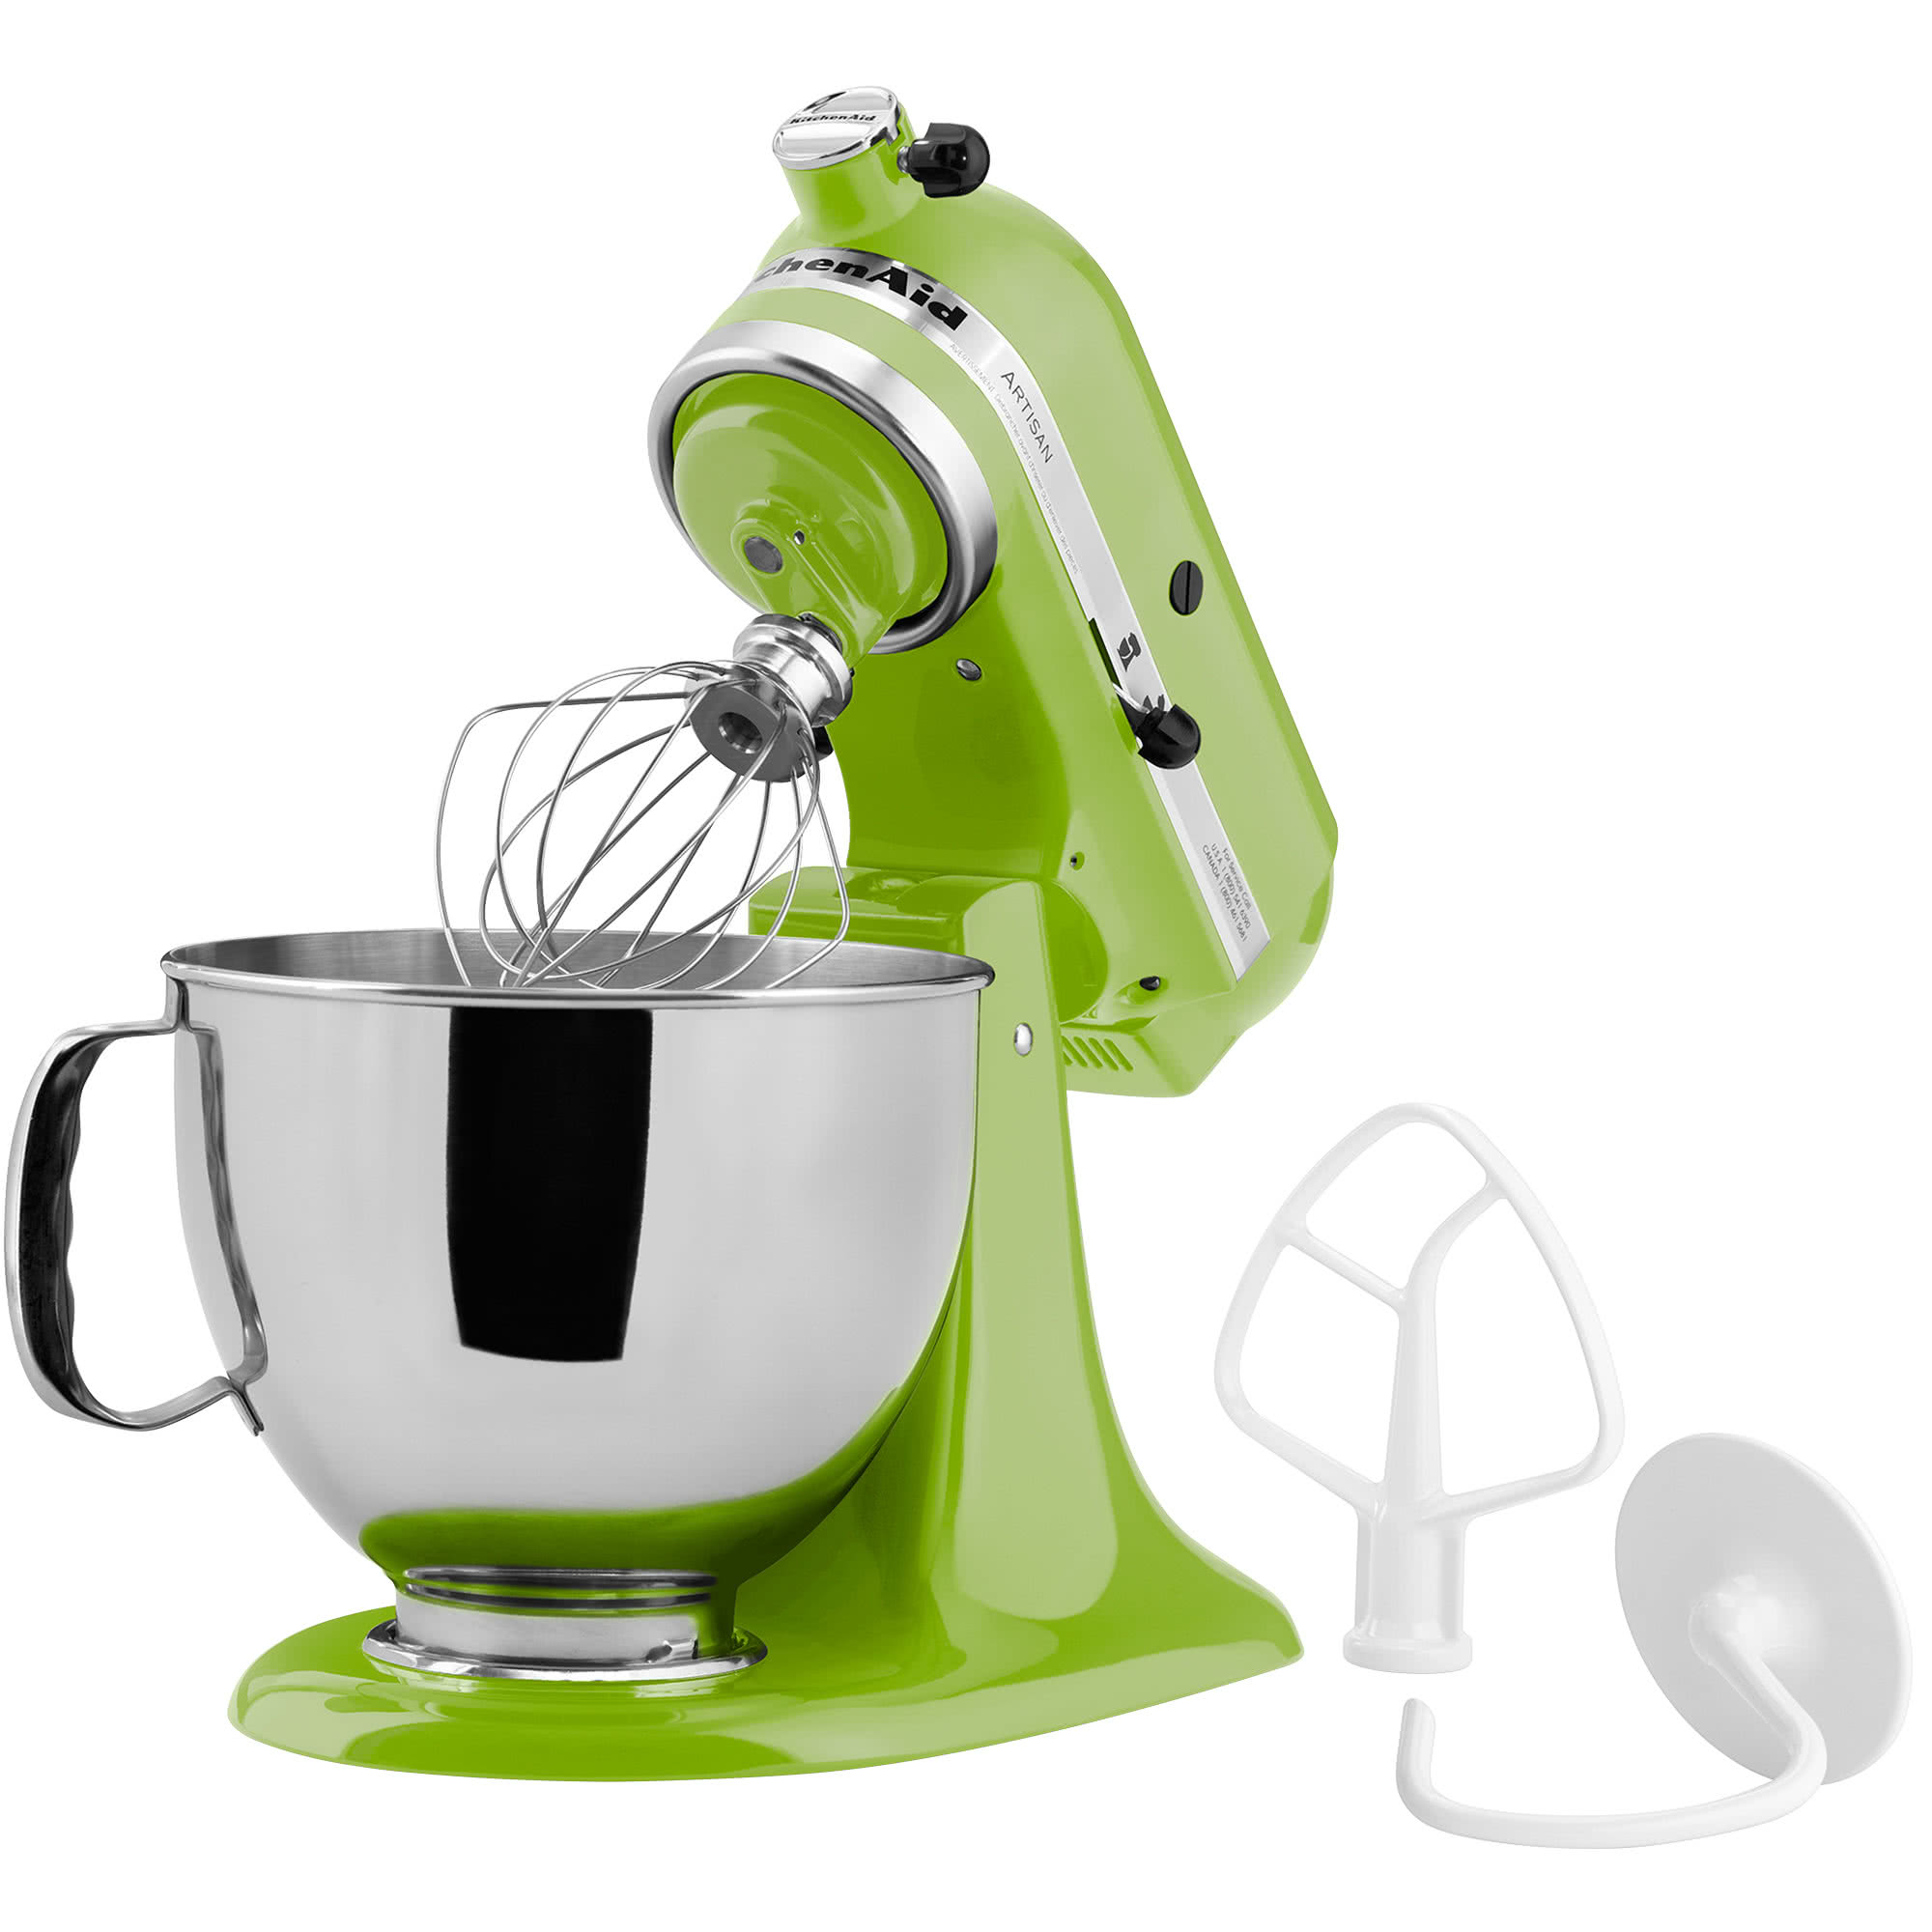 kitchenaid artisan series stand mixer green apple ksm150psga rh donsappliances com